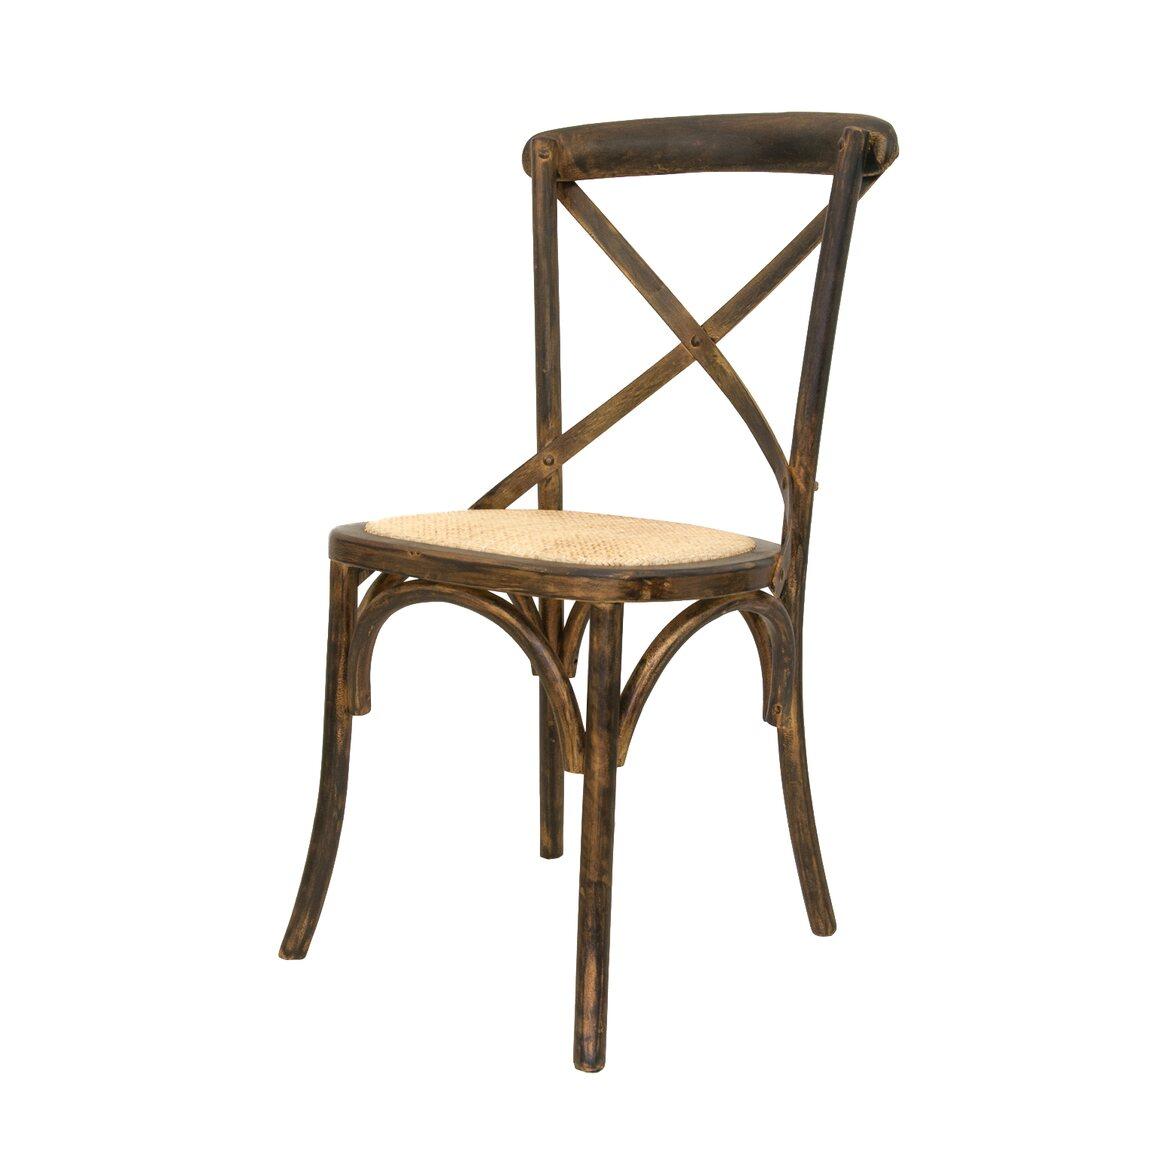 Стул Cross back bronze 4 | Обеденные стулья Kingsby